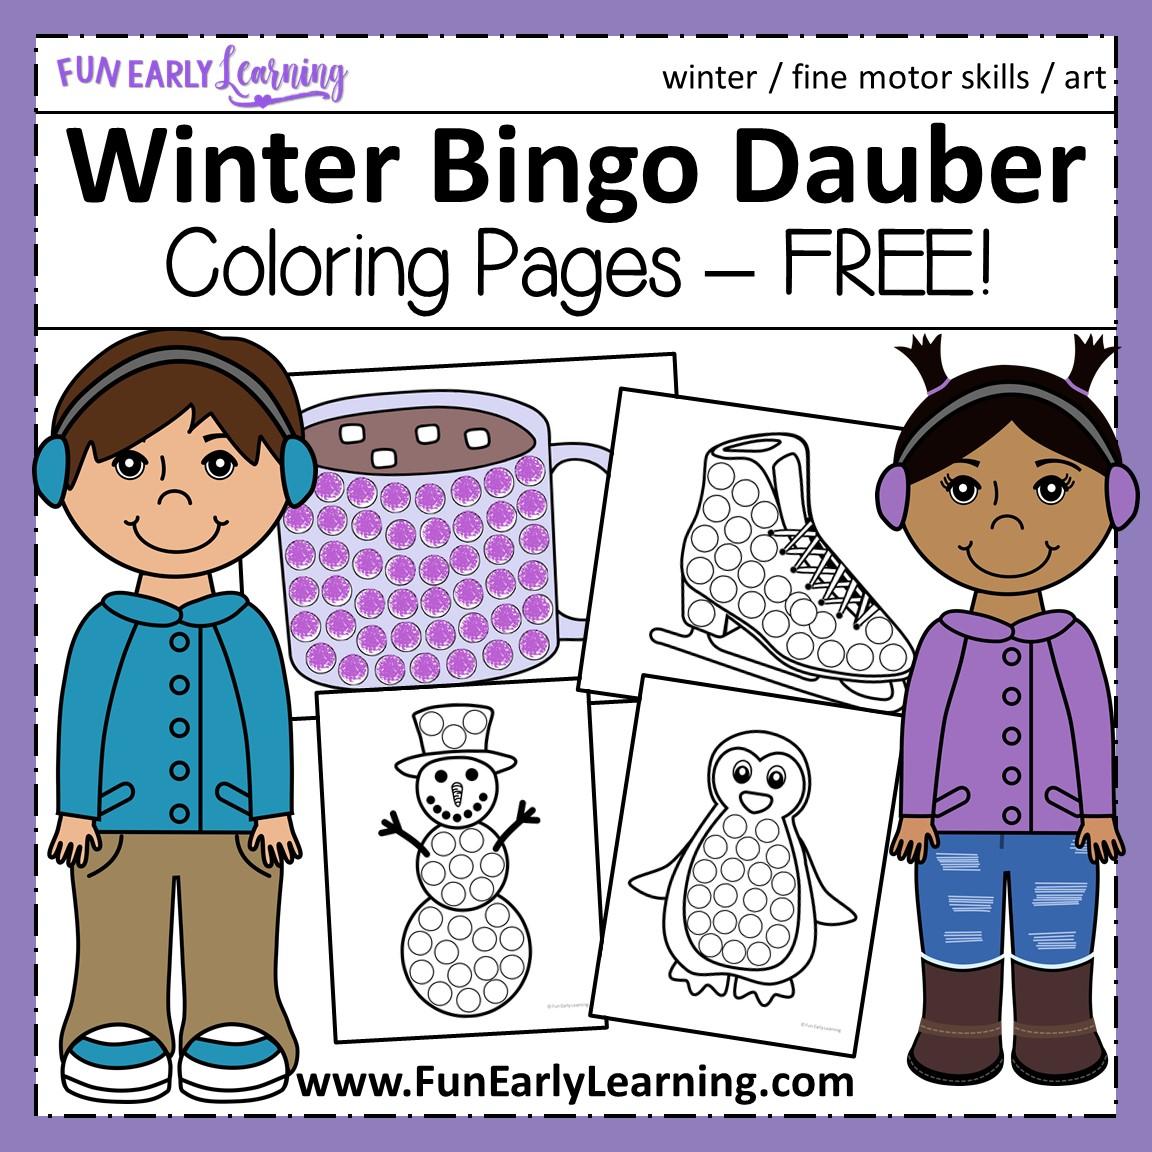 Winter Bingo Dauber Coloring Pages Free Printable